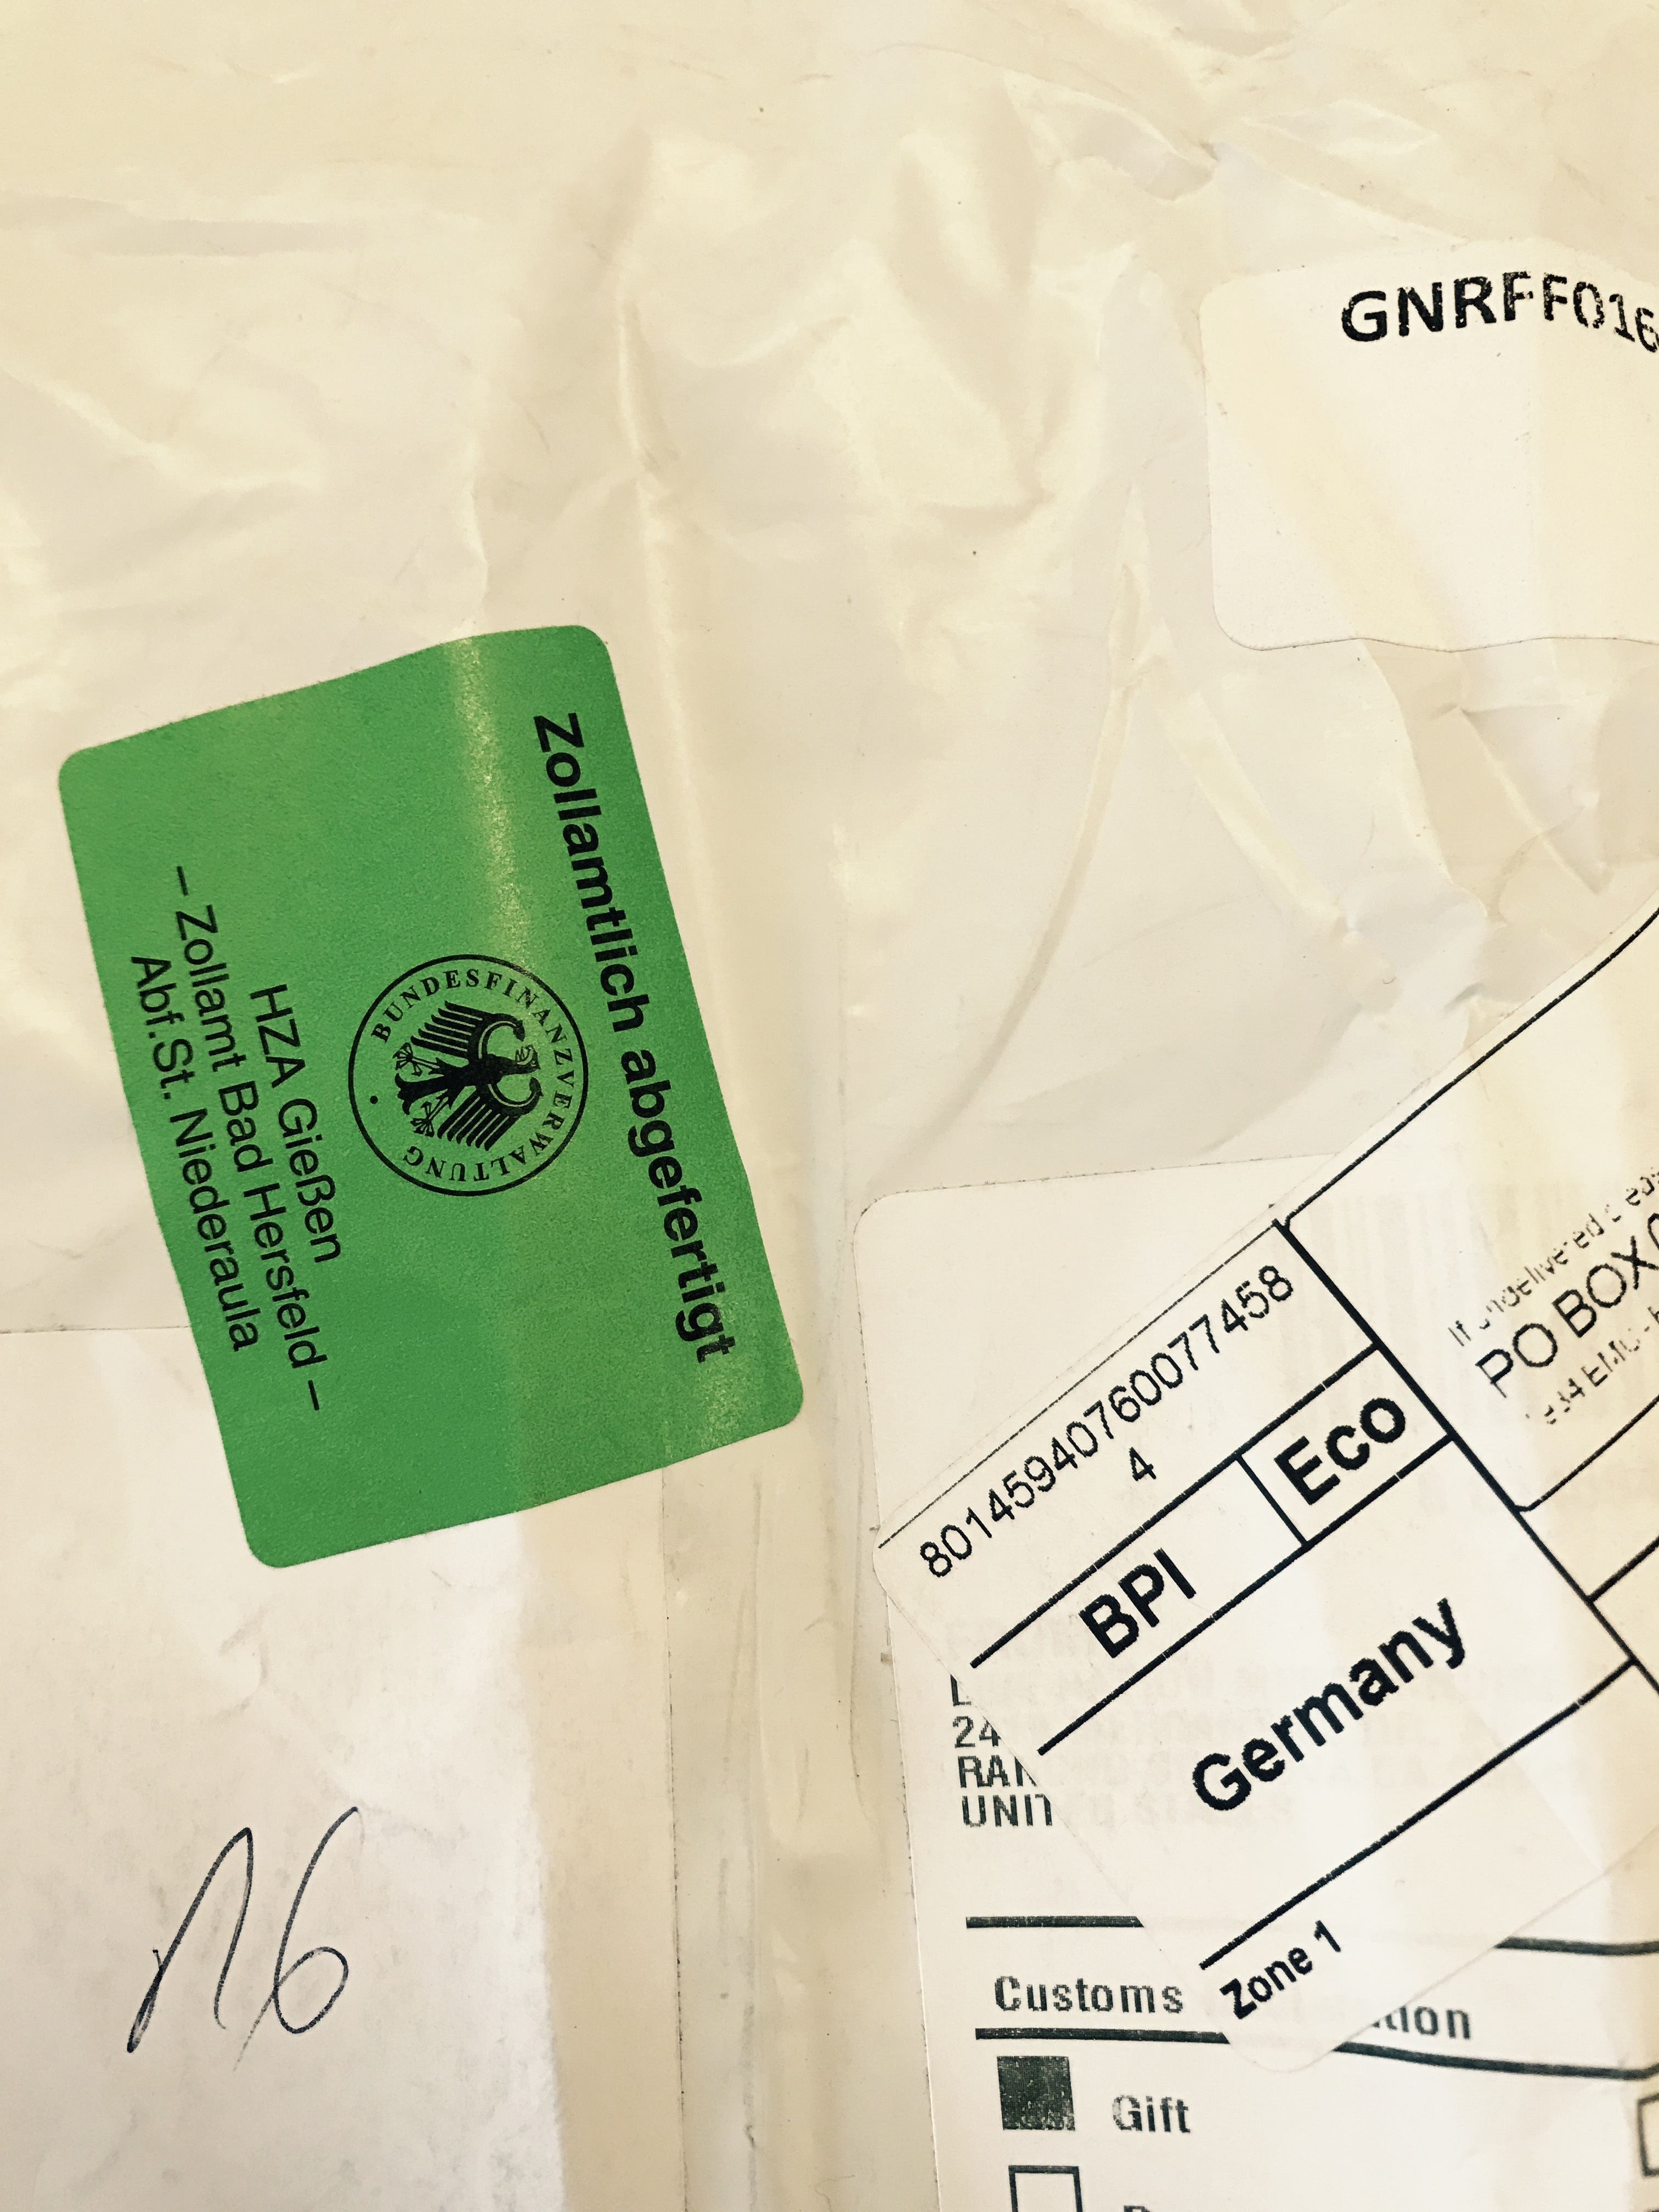 Rechtsanwältin Heike Michaelis Neue psychoaktive Stoffe Gesetz NpSG